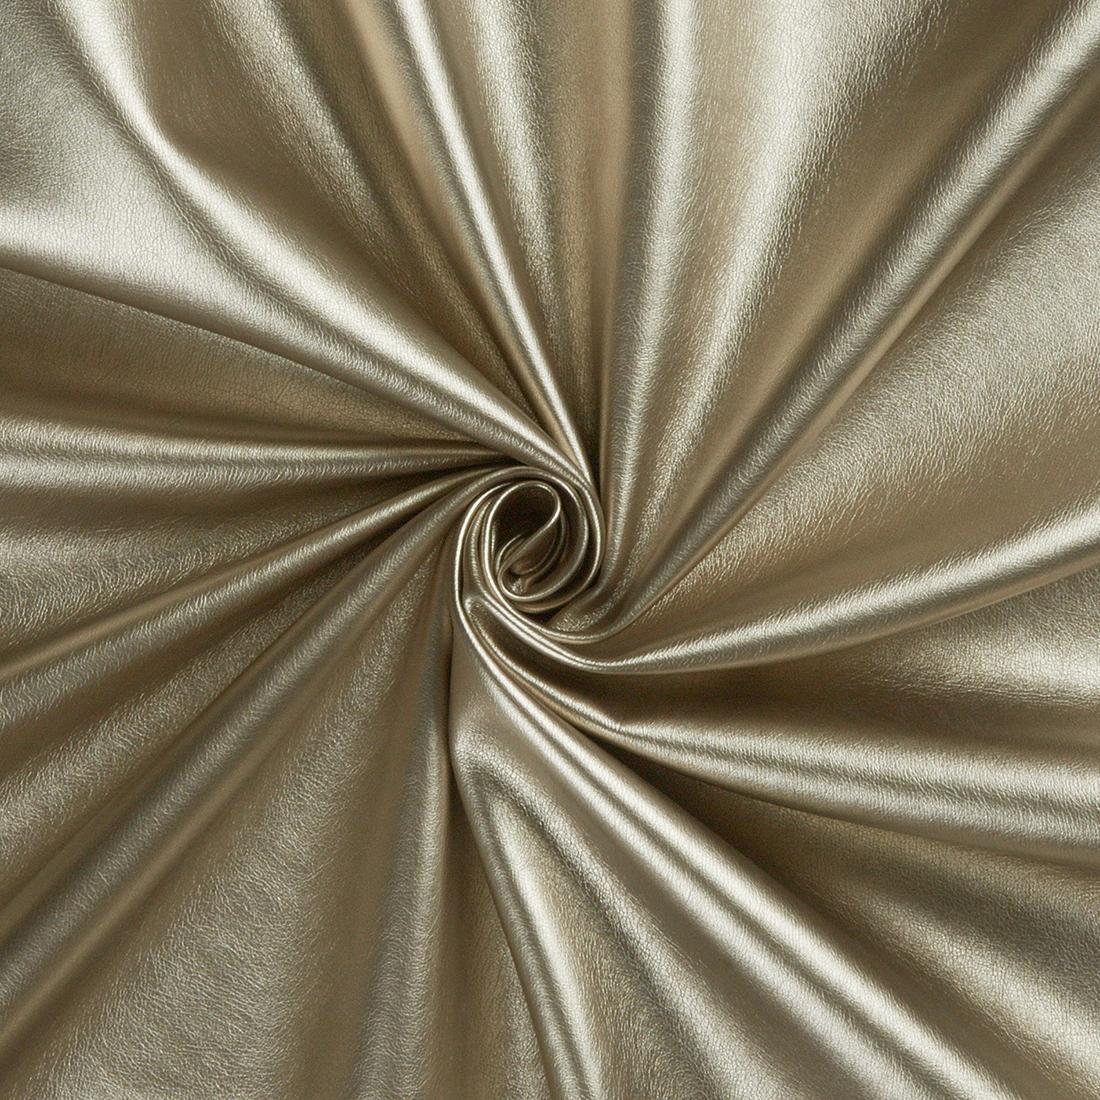 Leatherlook Gold Dress Fabric